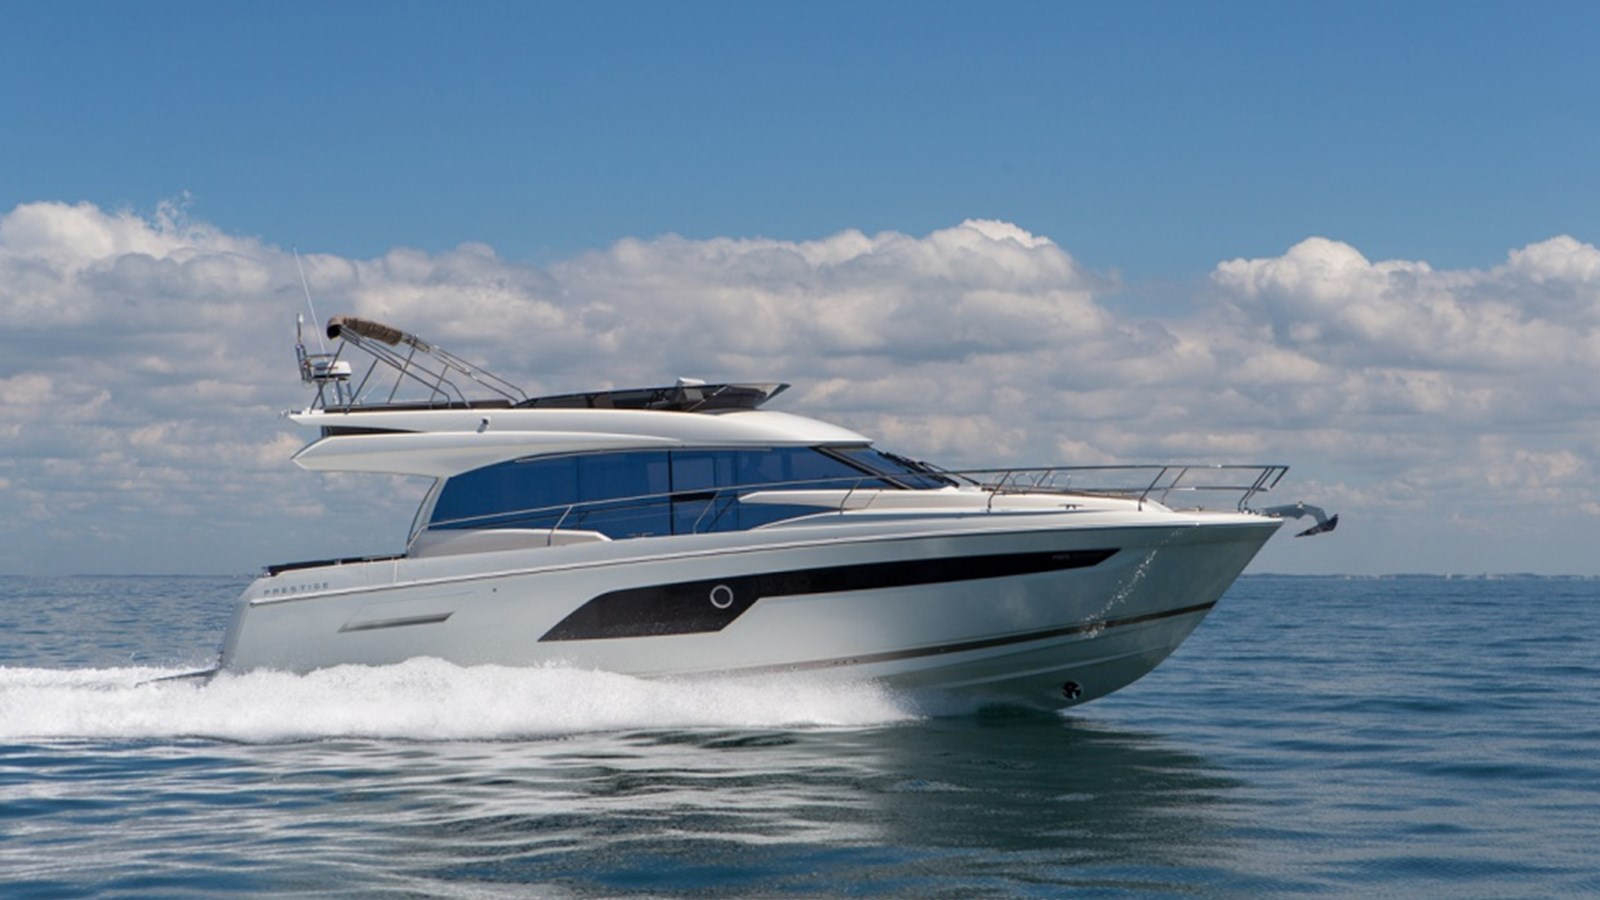 New Prestige 520 Flybridge Yachts For Sale